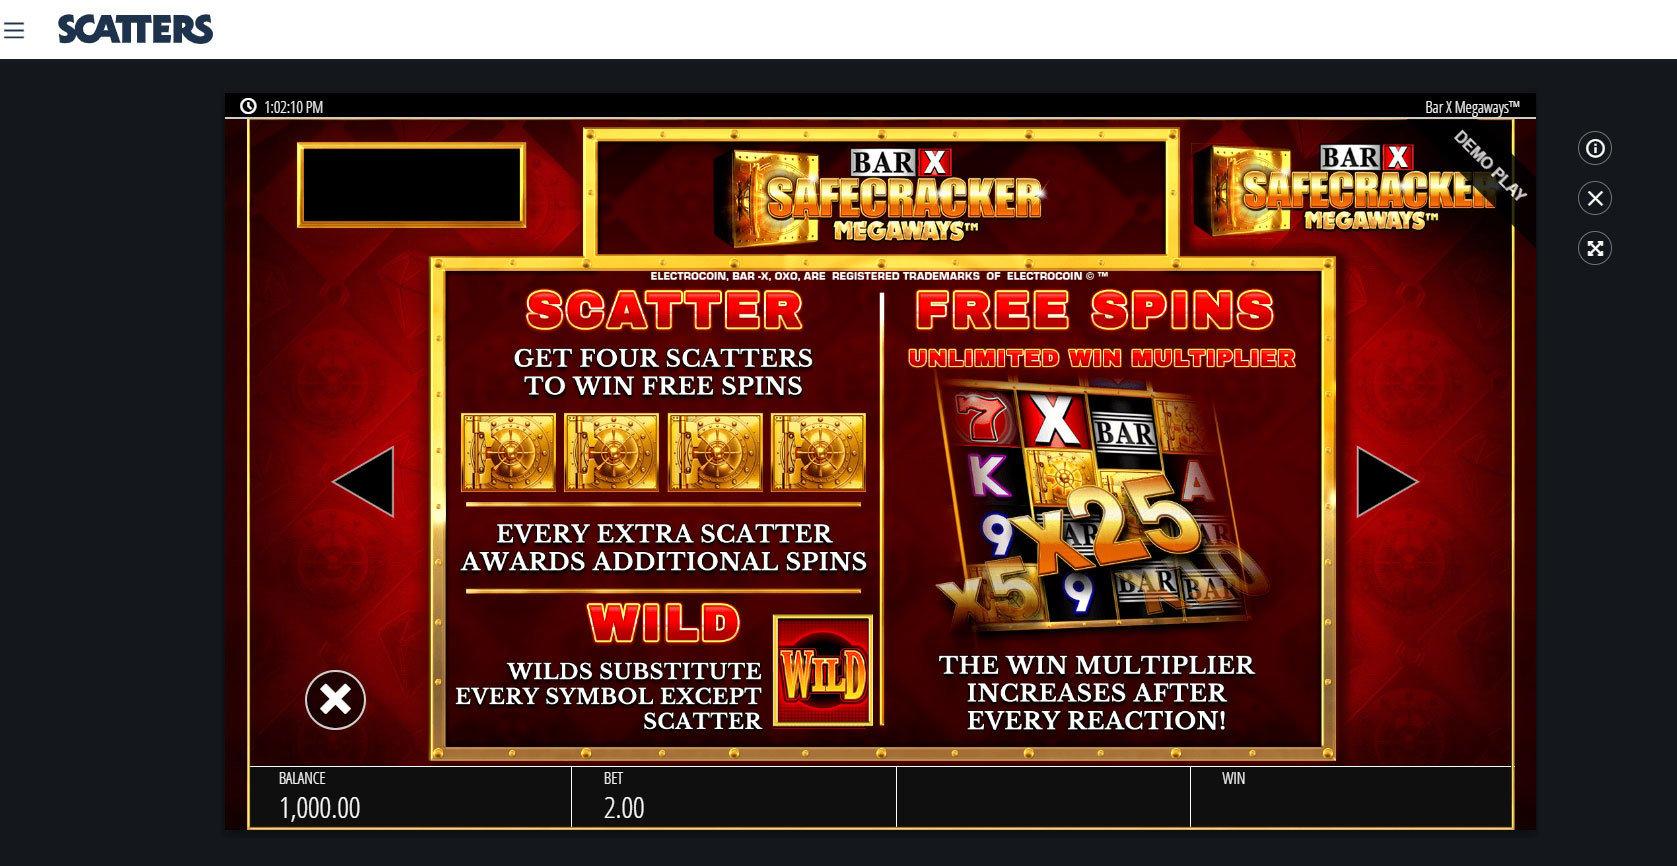 Megaways Slots: Bar X Safecracker - Scatters Online Casino